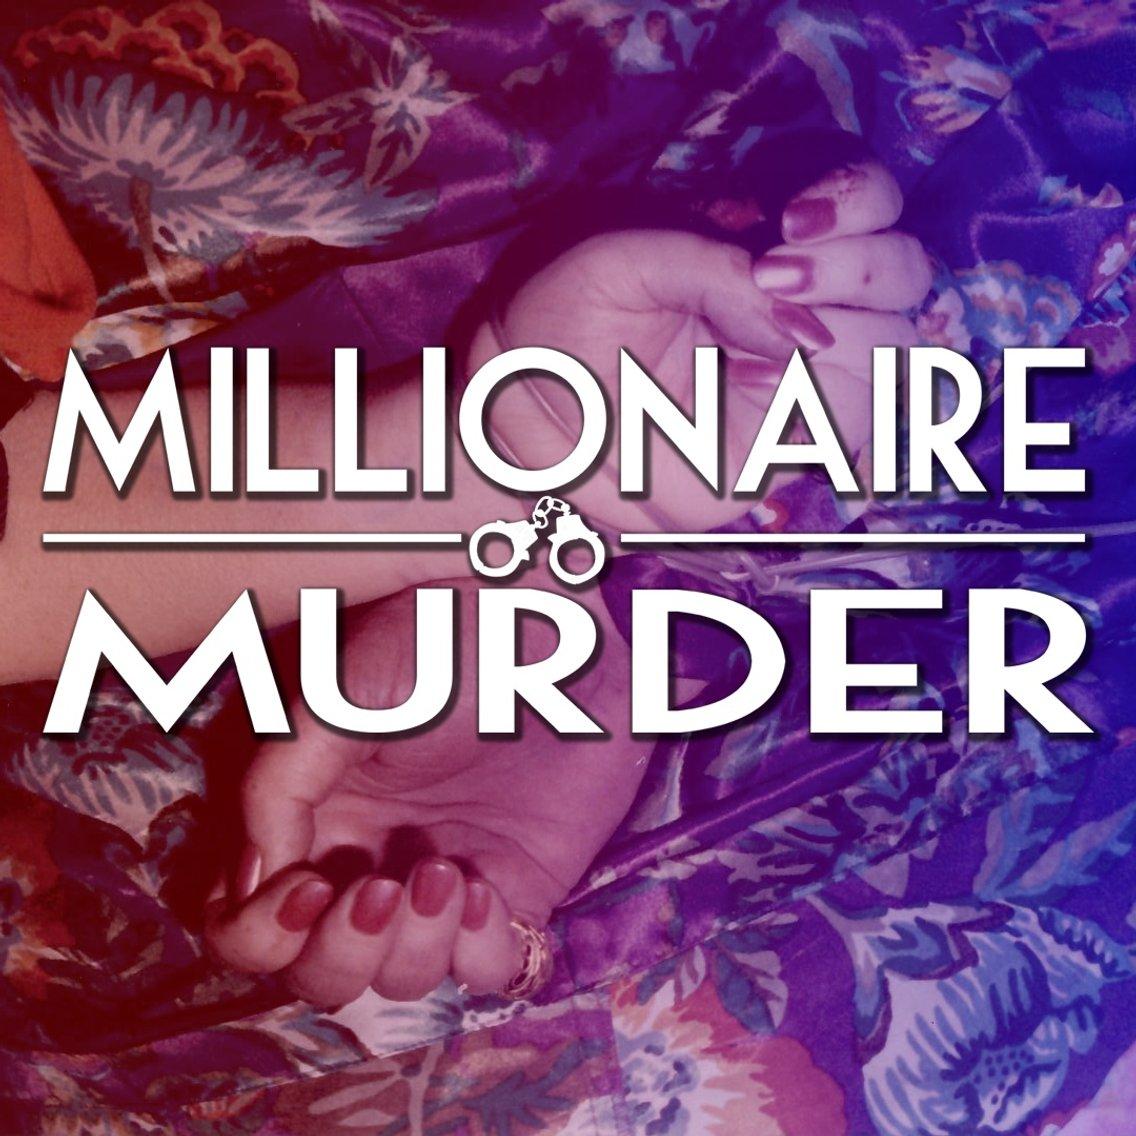 Millionaire Murder - immagine di copertina